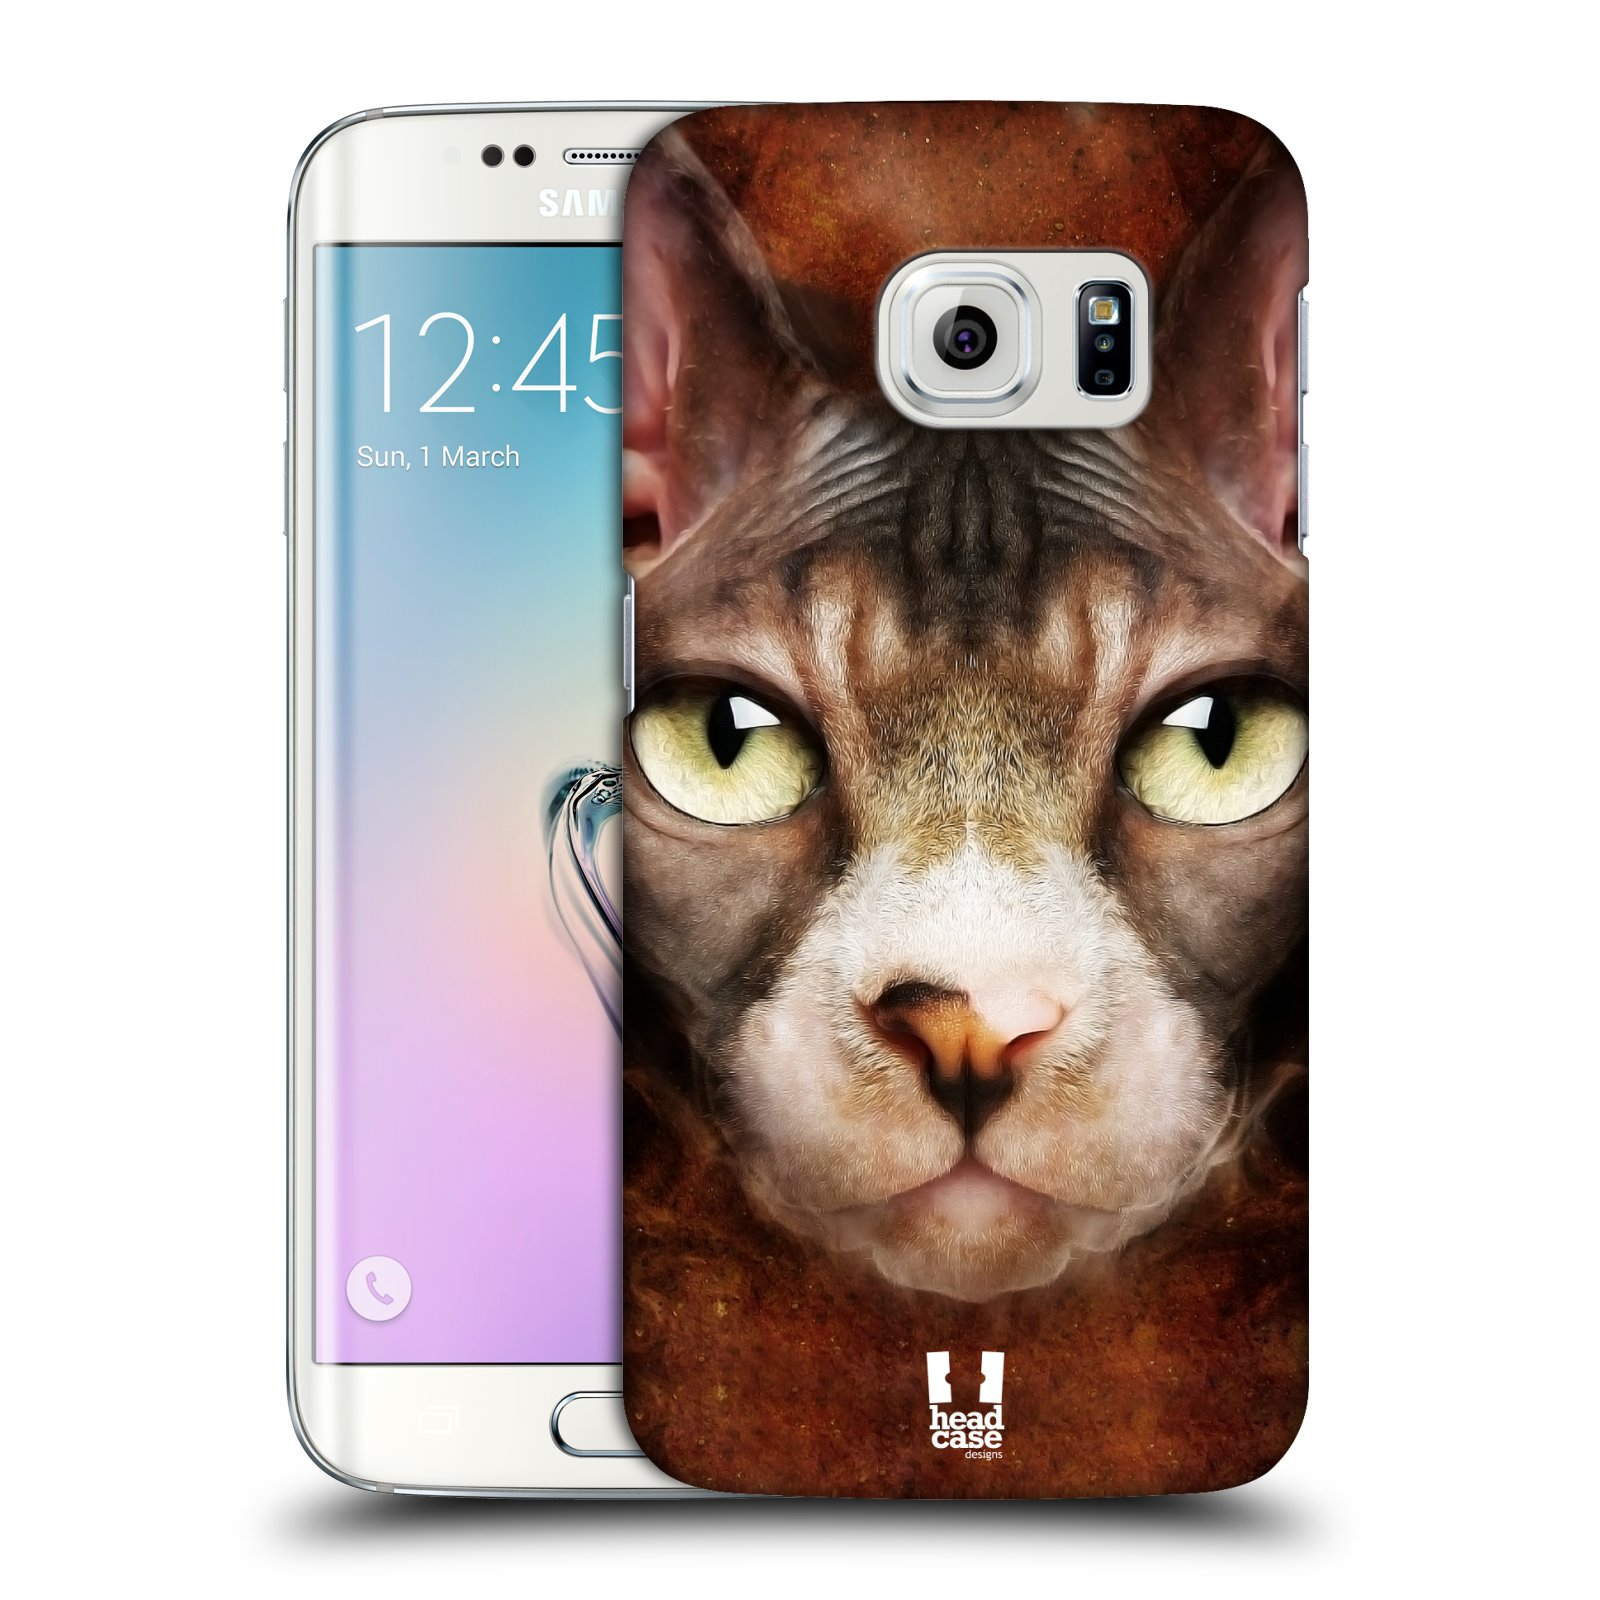 HEAD CASE plastový obal na mobil SAMSUNG Galaxy S6 EDGE (G9250, G925, G925F) vzor Zvířecí tváře kočka sphynx